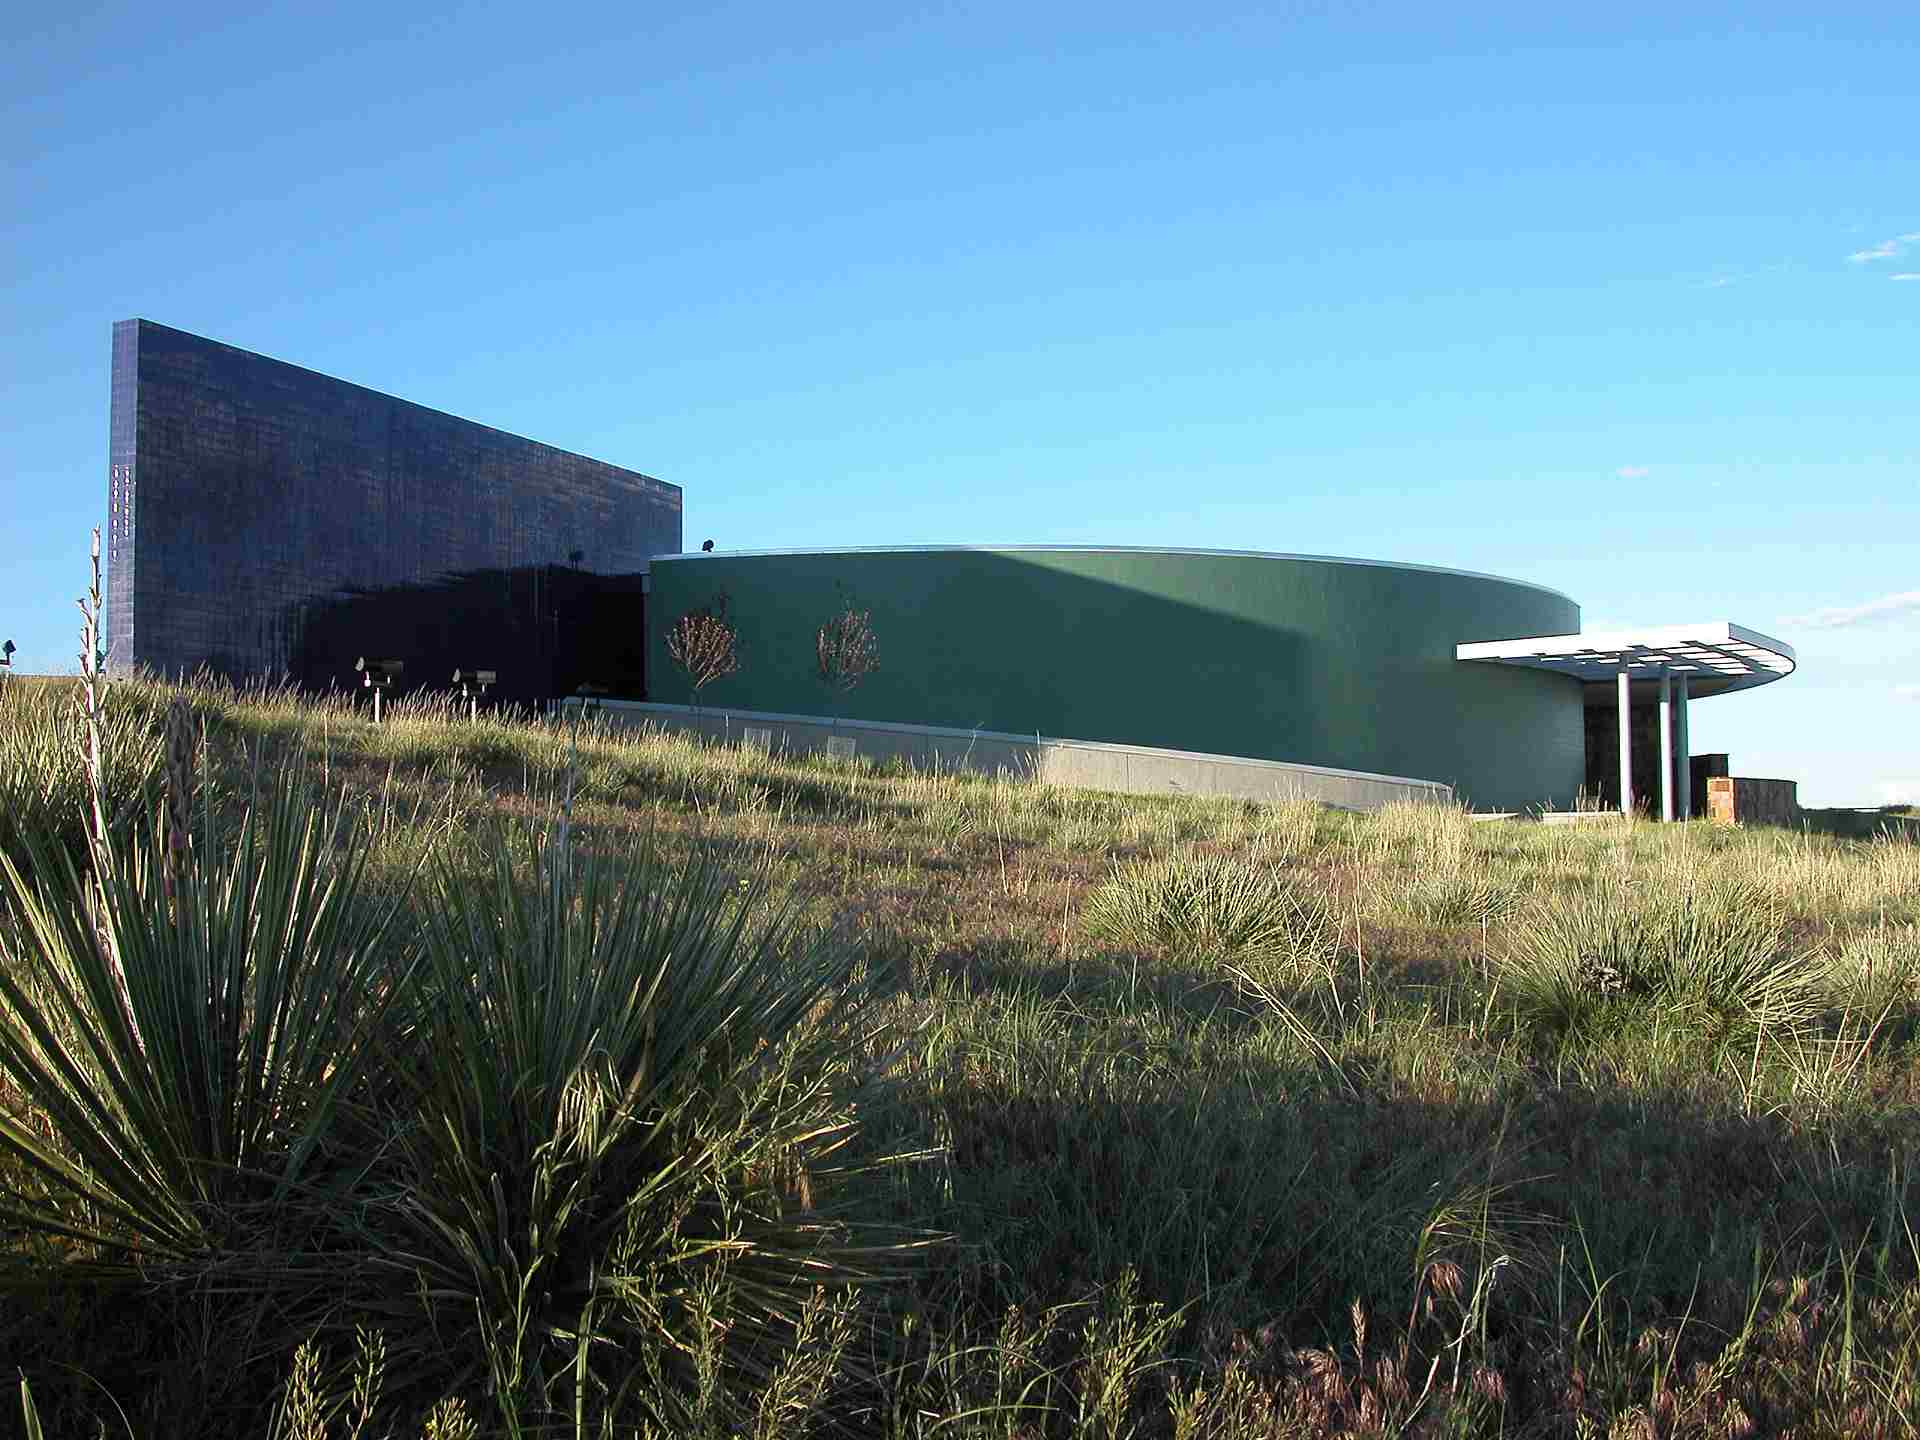 The National Historic Trails Interpretive Center